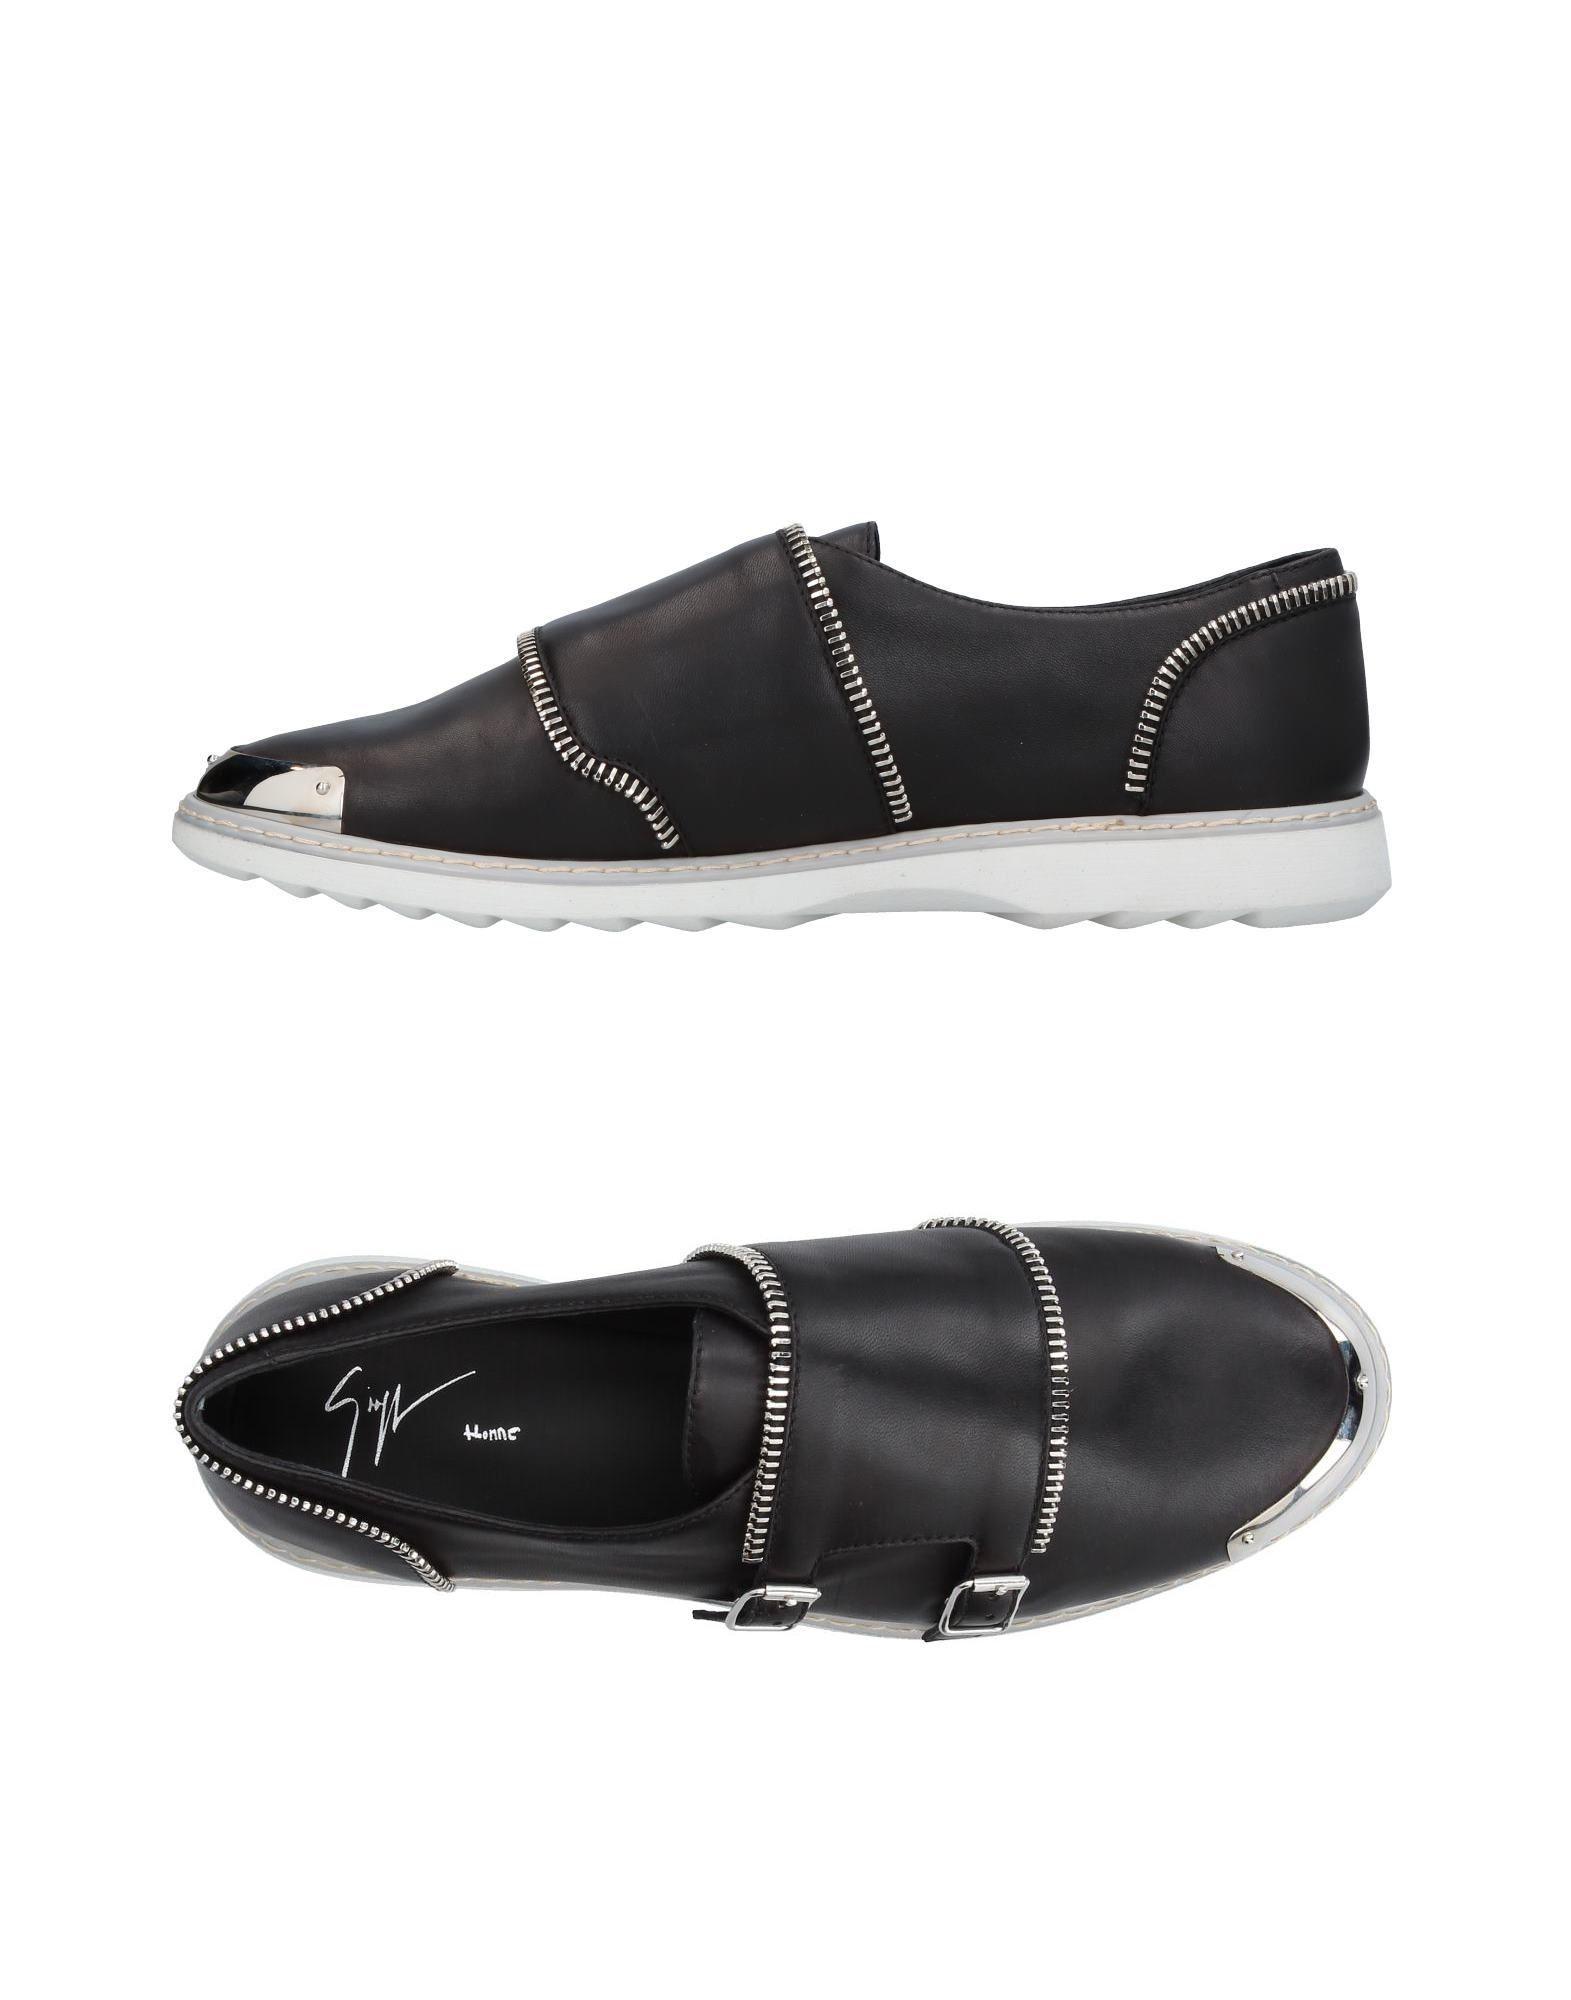 Giuseppe Zanotti Sneakers Herren  11400082QX Gute Qualität beliebte Schuhe